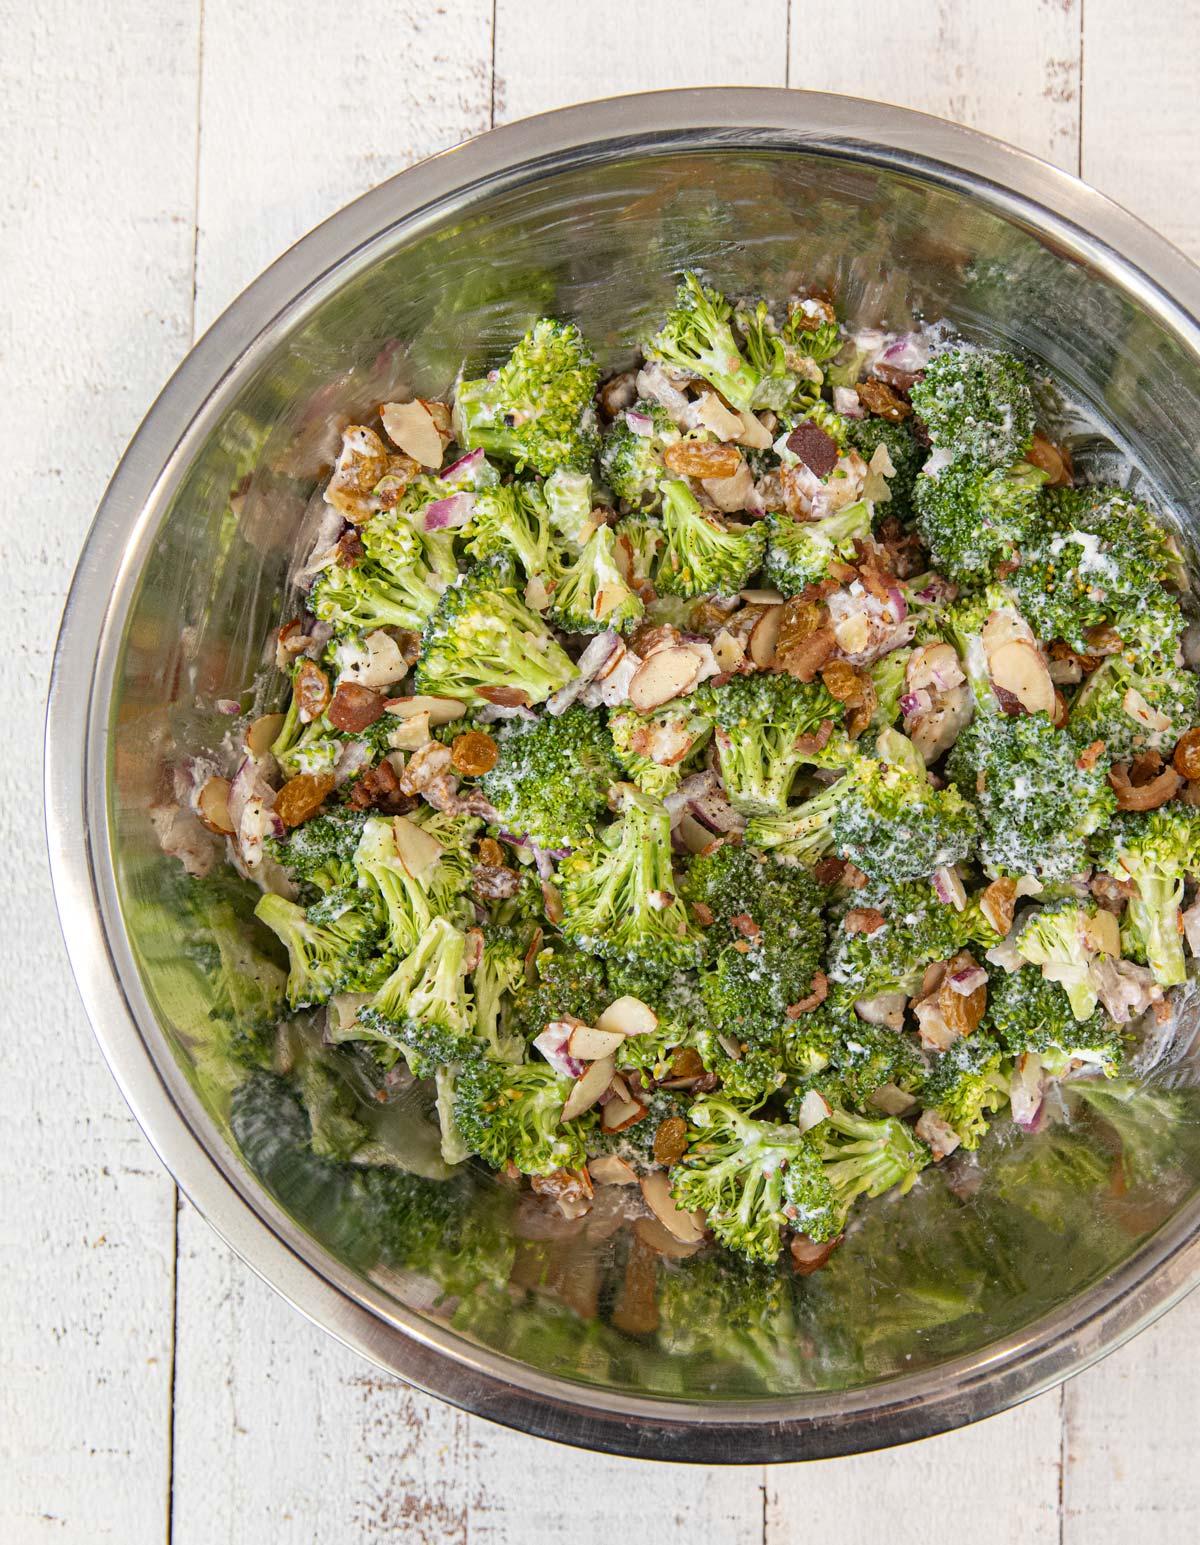 Healthy Broccoli Salad in metal mixing bowl